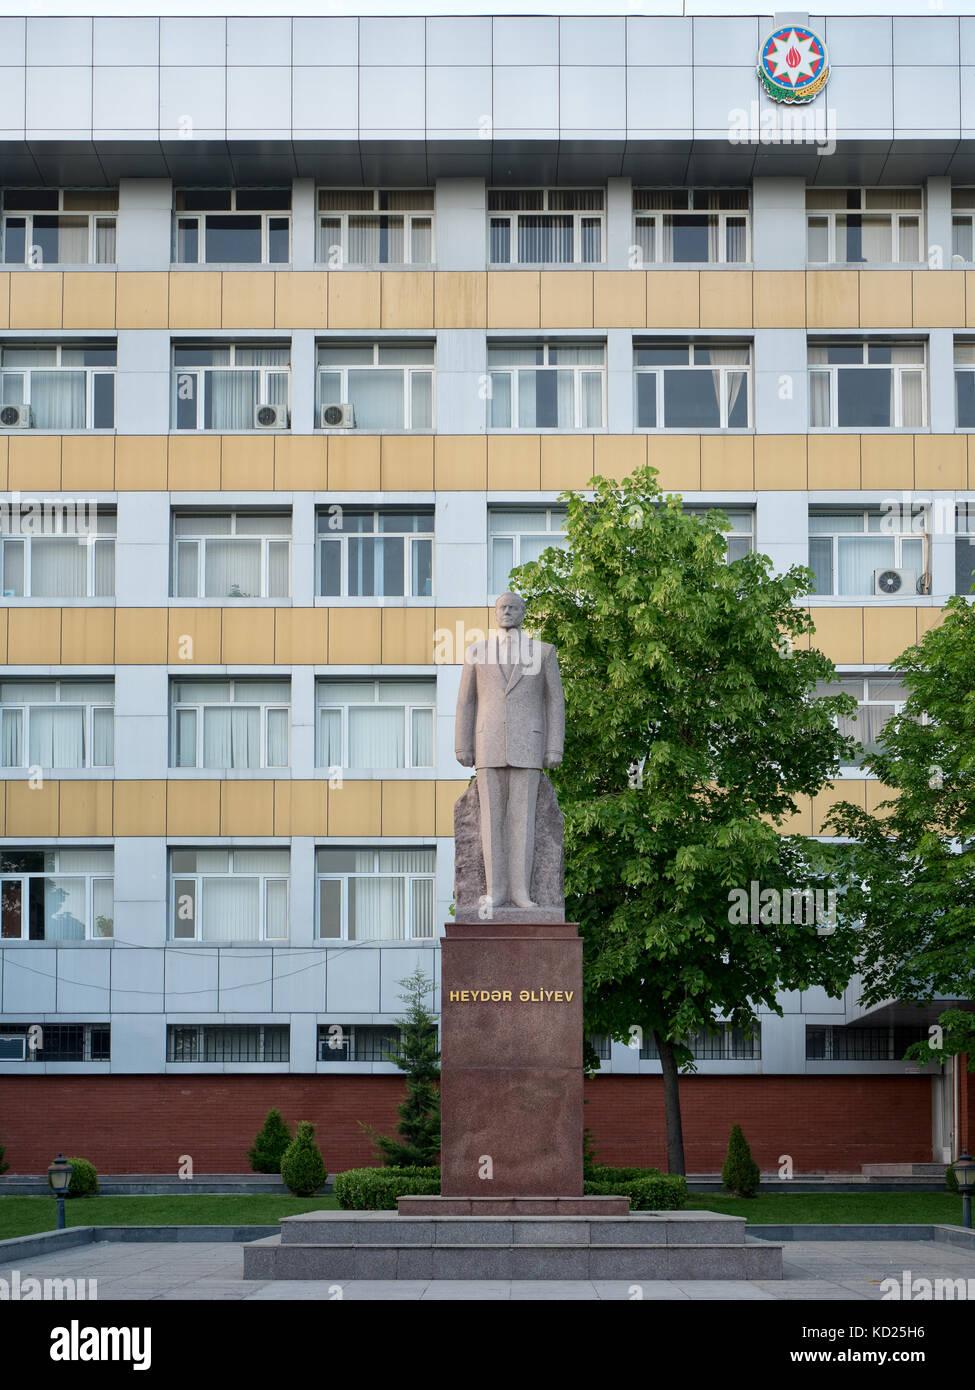 Statue of former president Heydar Aliyev in front of a public building, socialist architecture in Sheki, Azerbaijan - Stock Image